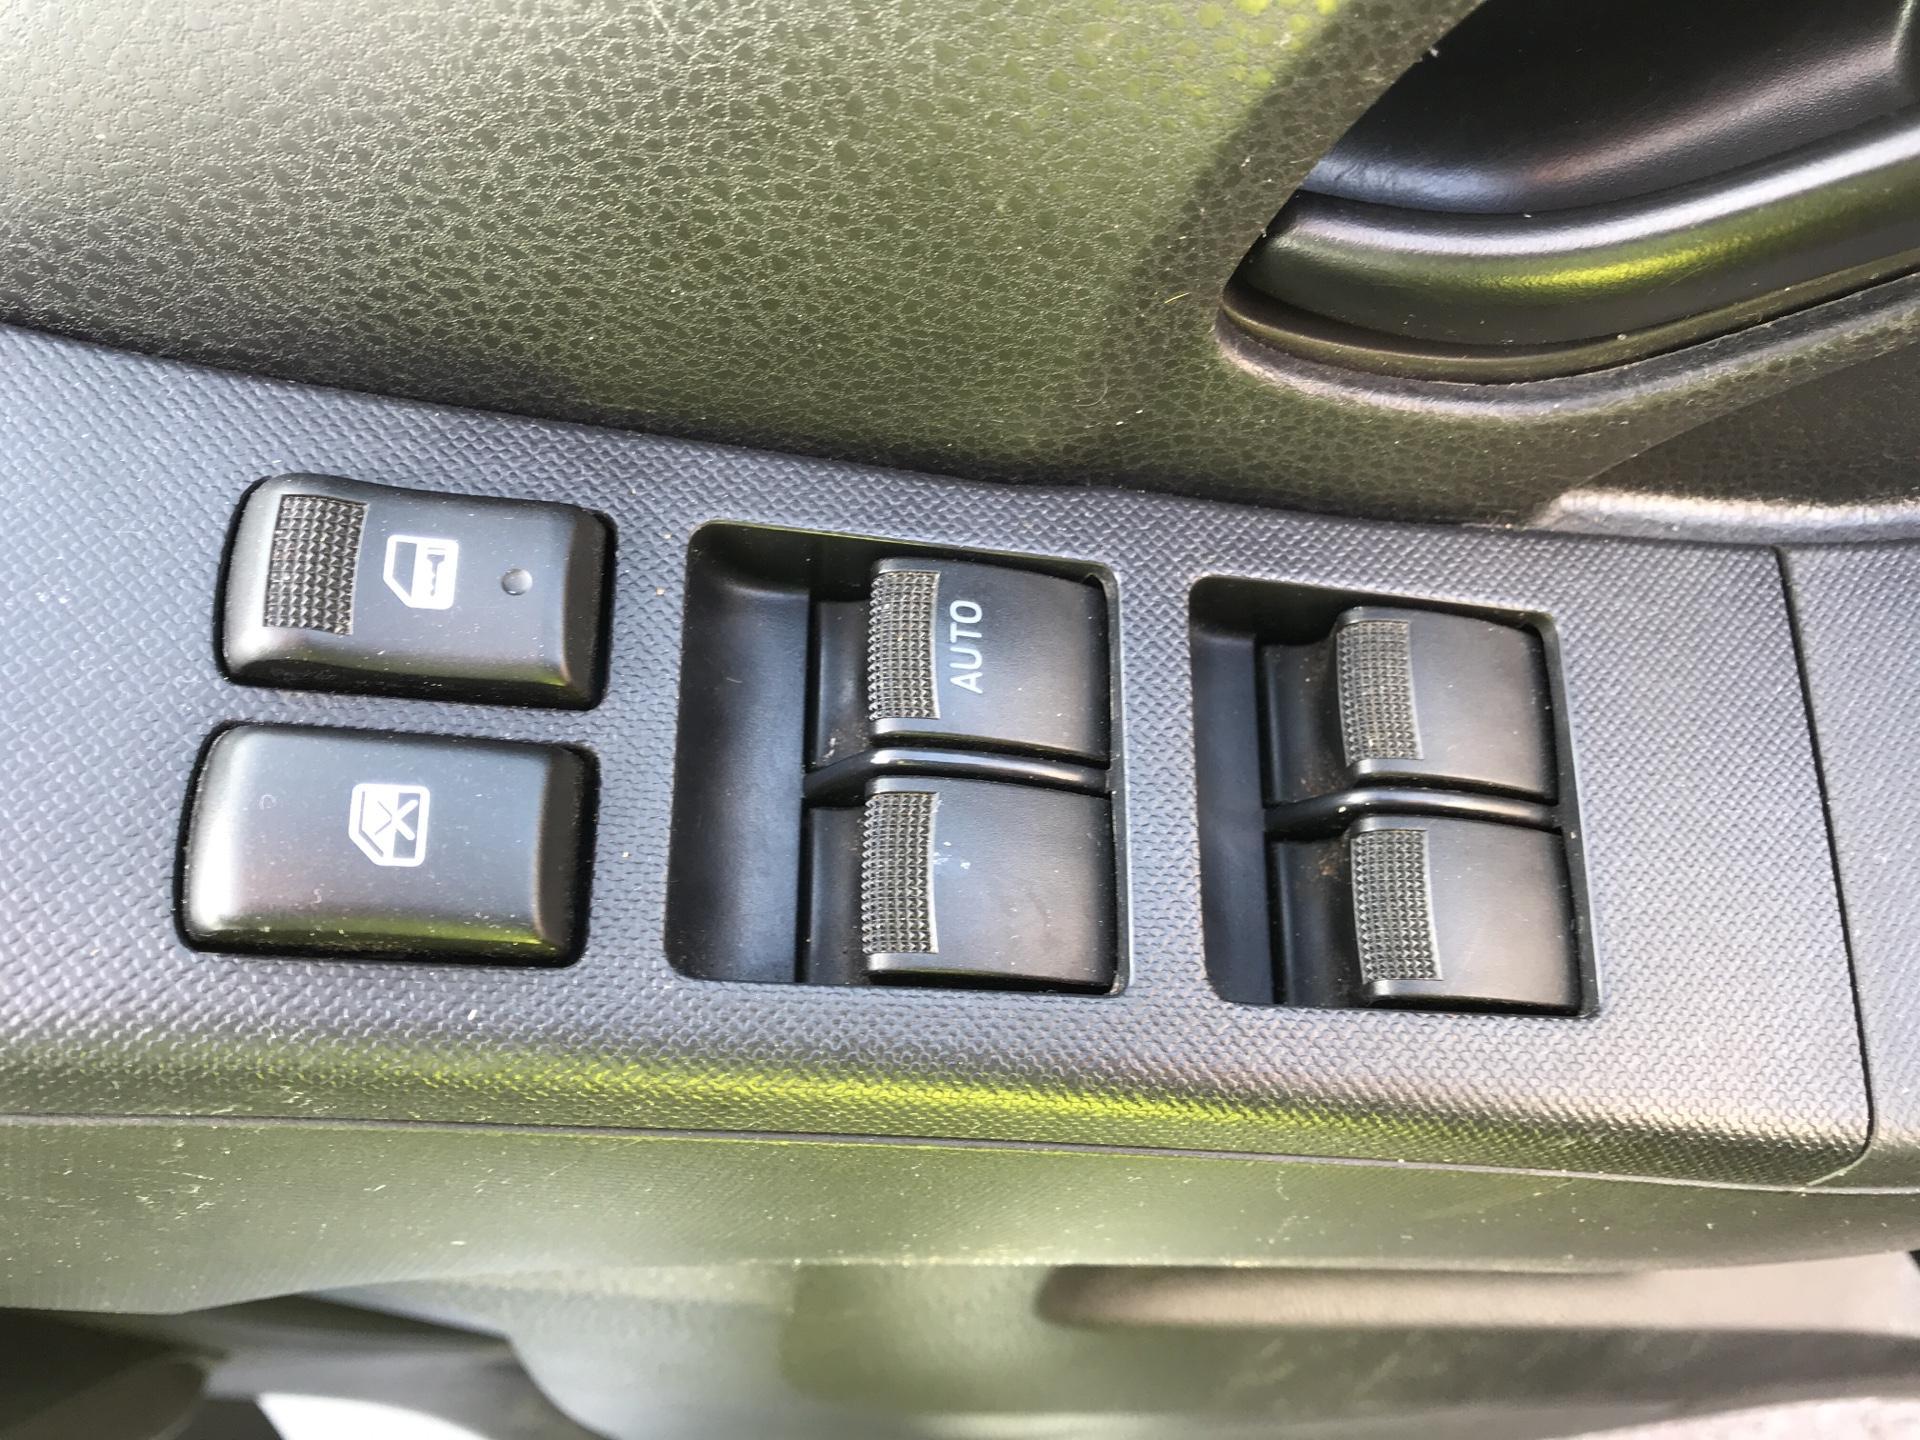 2016 Isuzu D-Max  Double Cab 4 x 4 2.5 TD Euro 5 (YD16PGF) Image 18